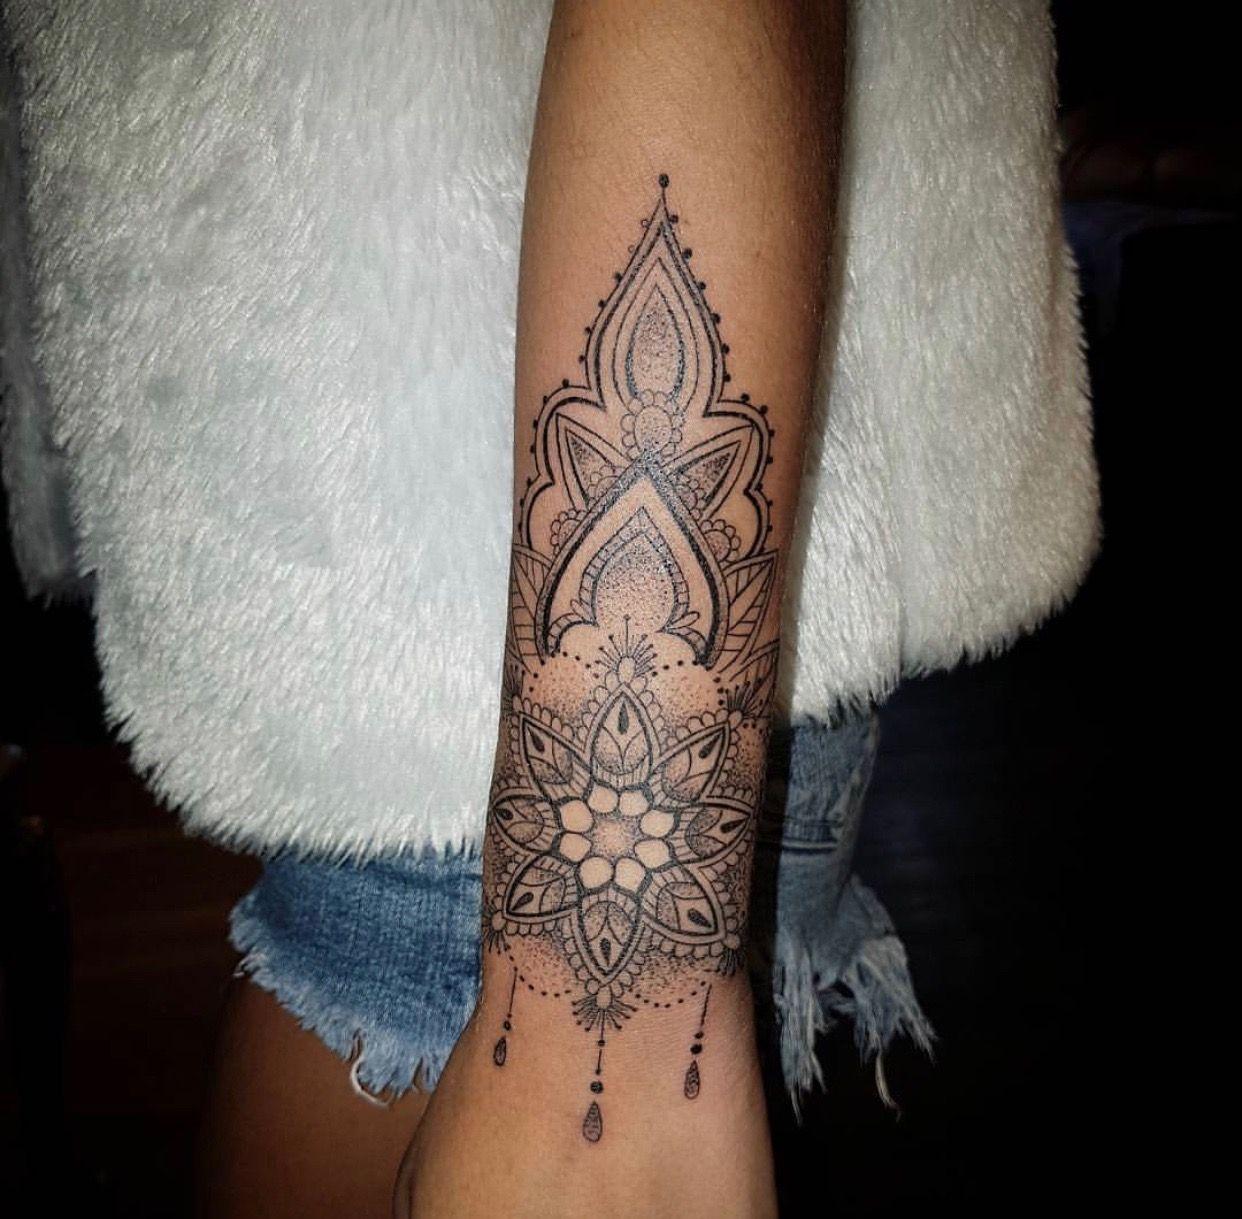 Pin By Rina Marino On Art Mandala Hand Tattoos Forearm Tattoo Women Forearm Mandala Tattoo